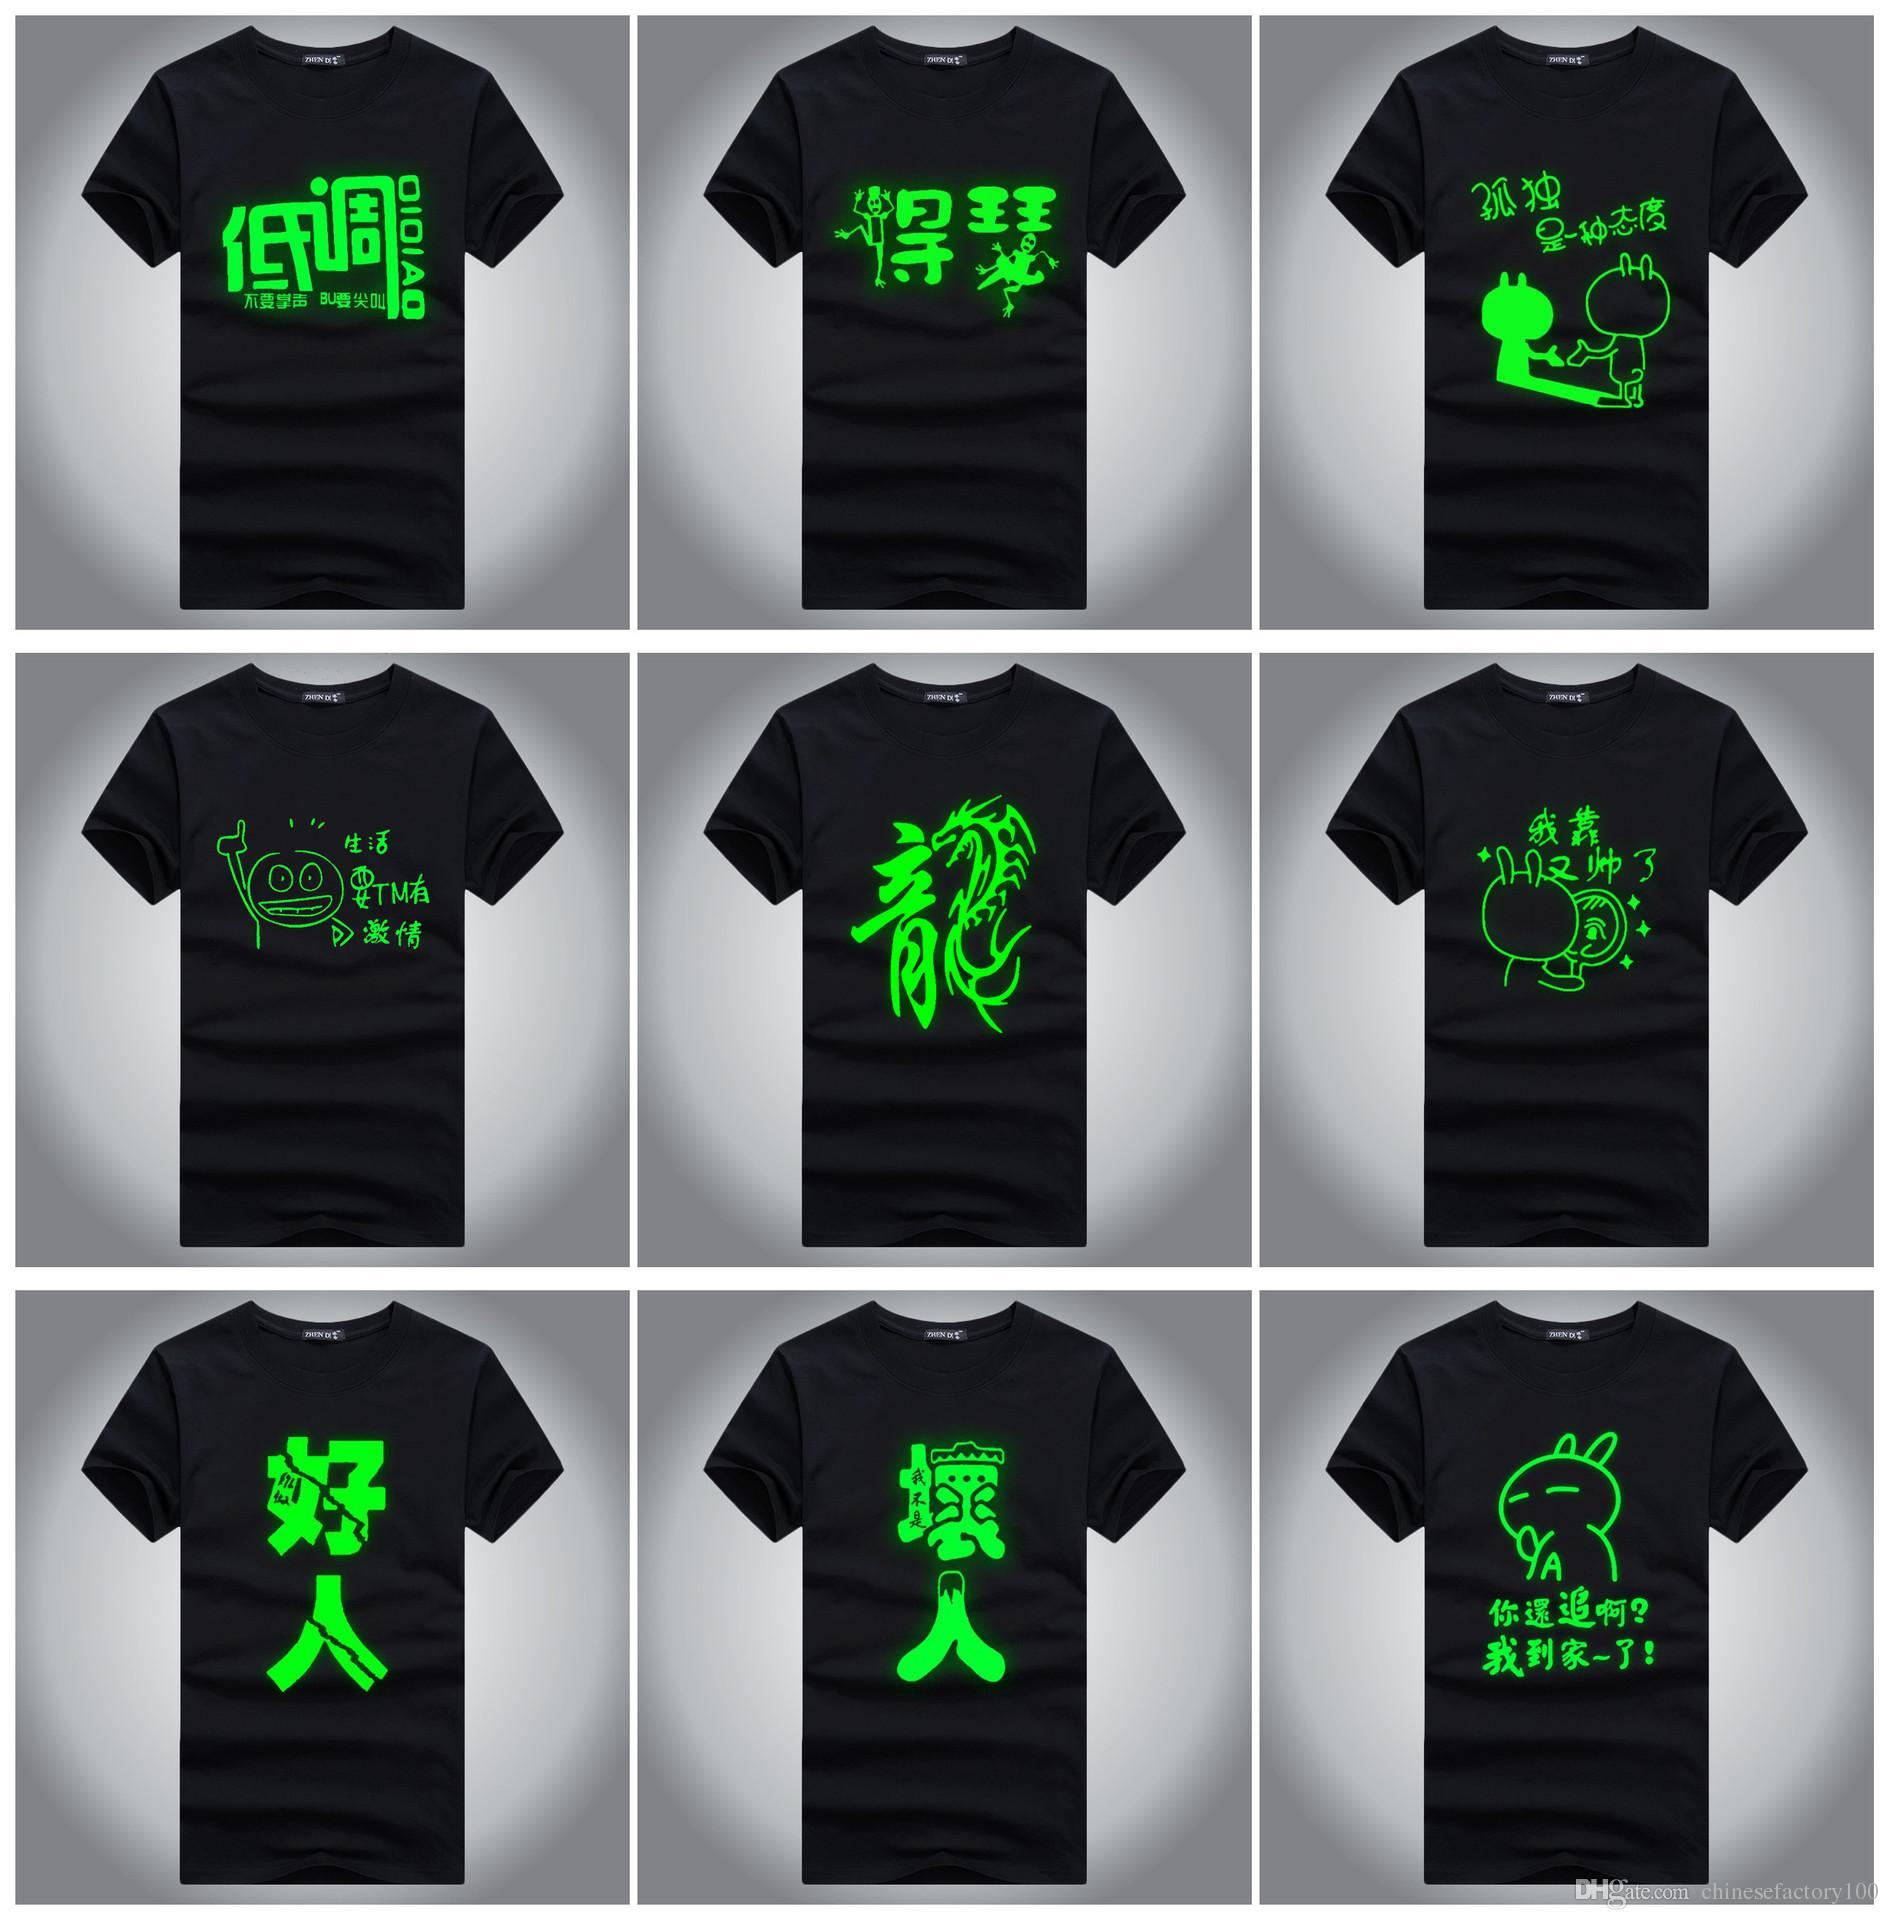 Shirt design online uk - 3d Shirts Men S Clothing Creative Printed Luminous Wolf Superman Chinese Words White T Shirts Fashion Novelty Black Short Sleeves S 5xl